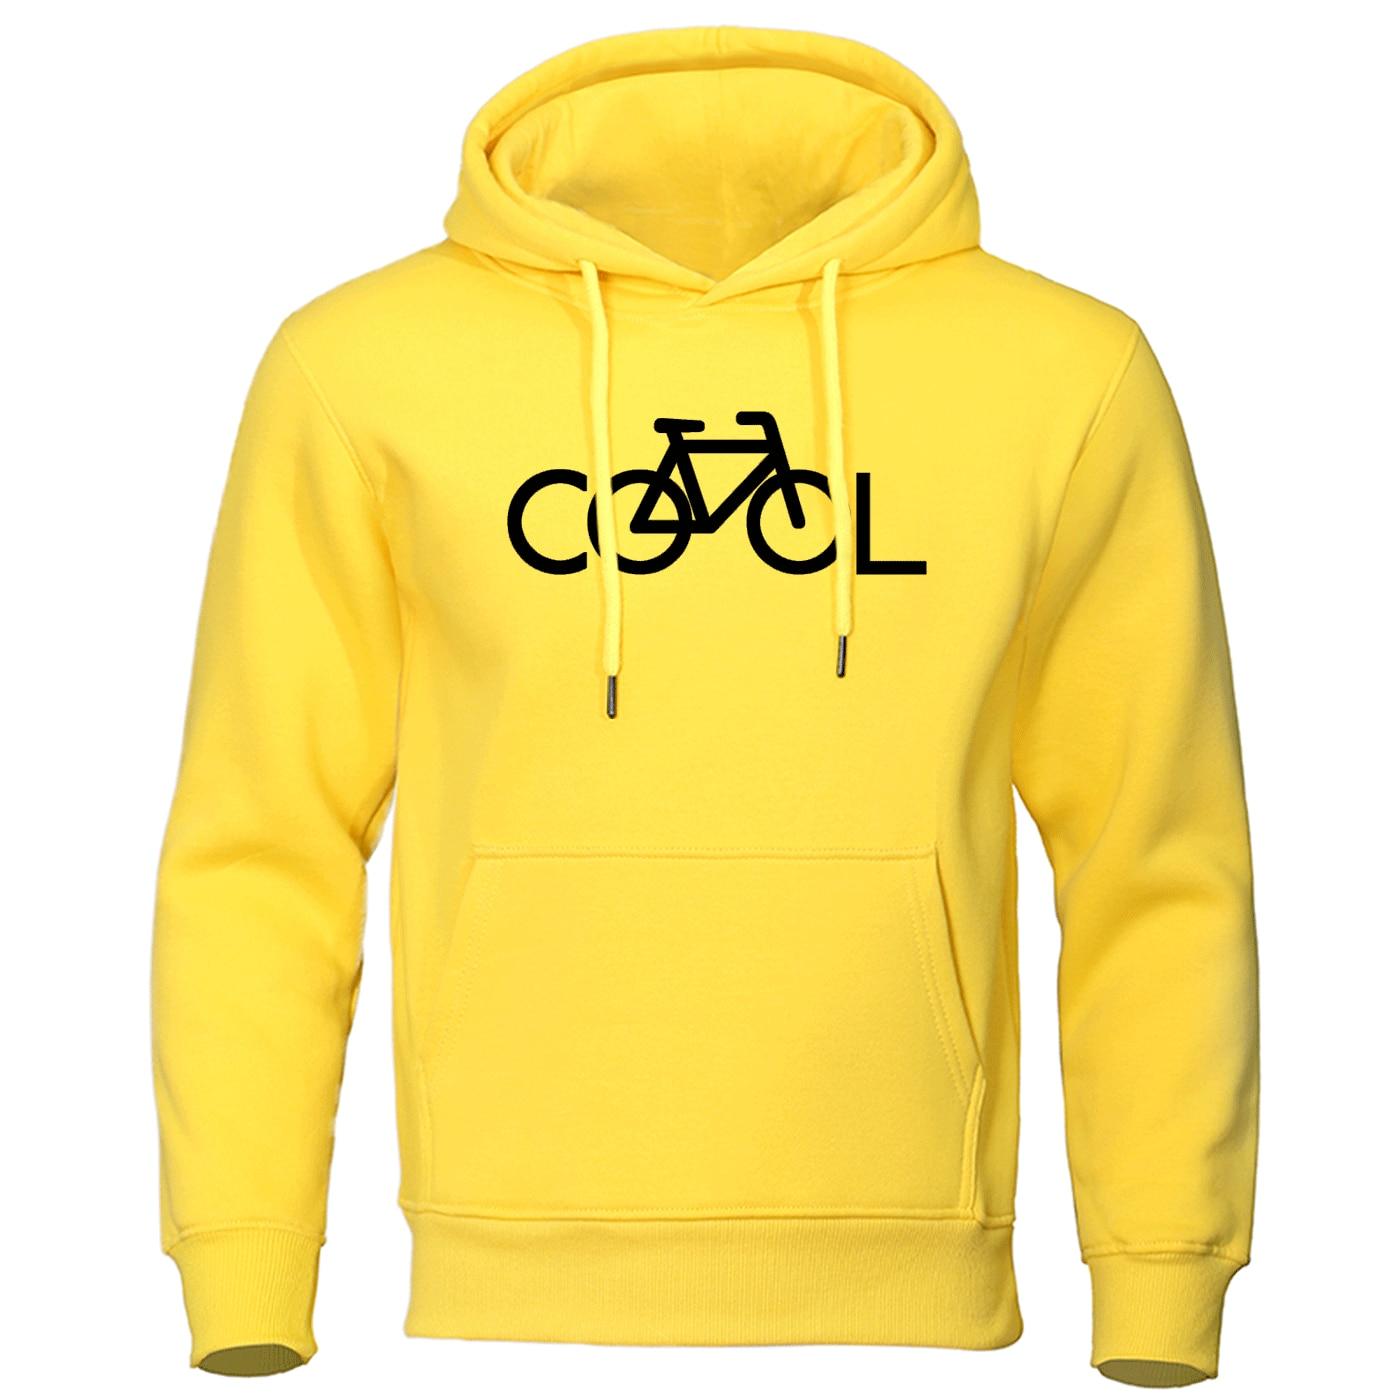 2019 Autumn Winter Hoodie Sweatshirt Man Casaul Bike It's Cool Hoodies Men Leisure Warm Brand Pullover Mens Clothes Streetwear